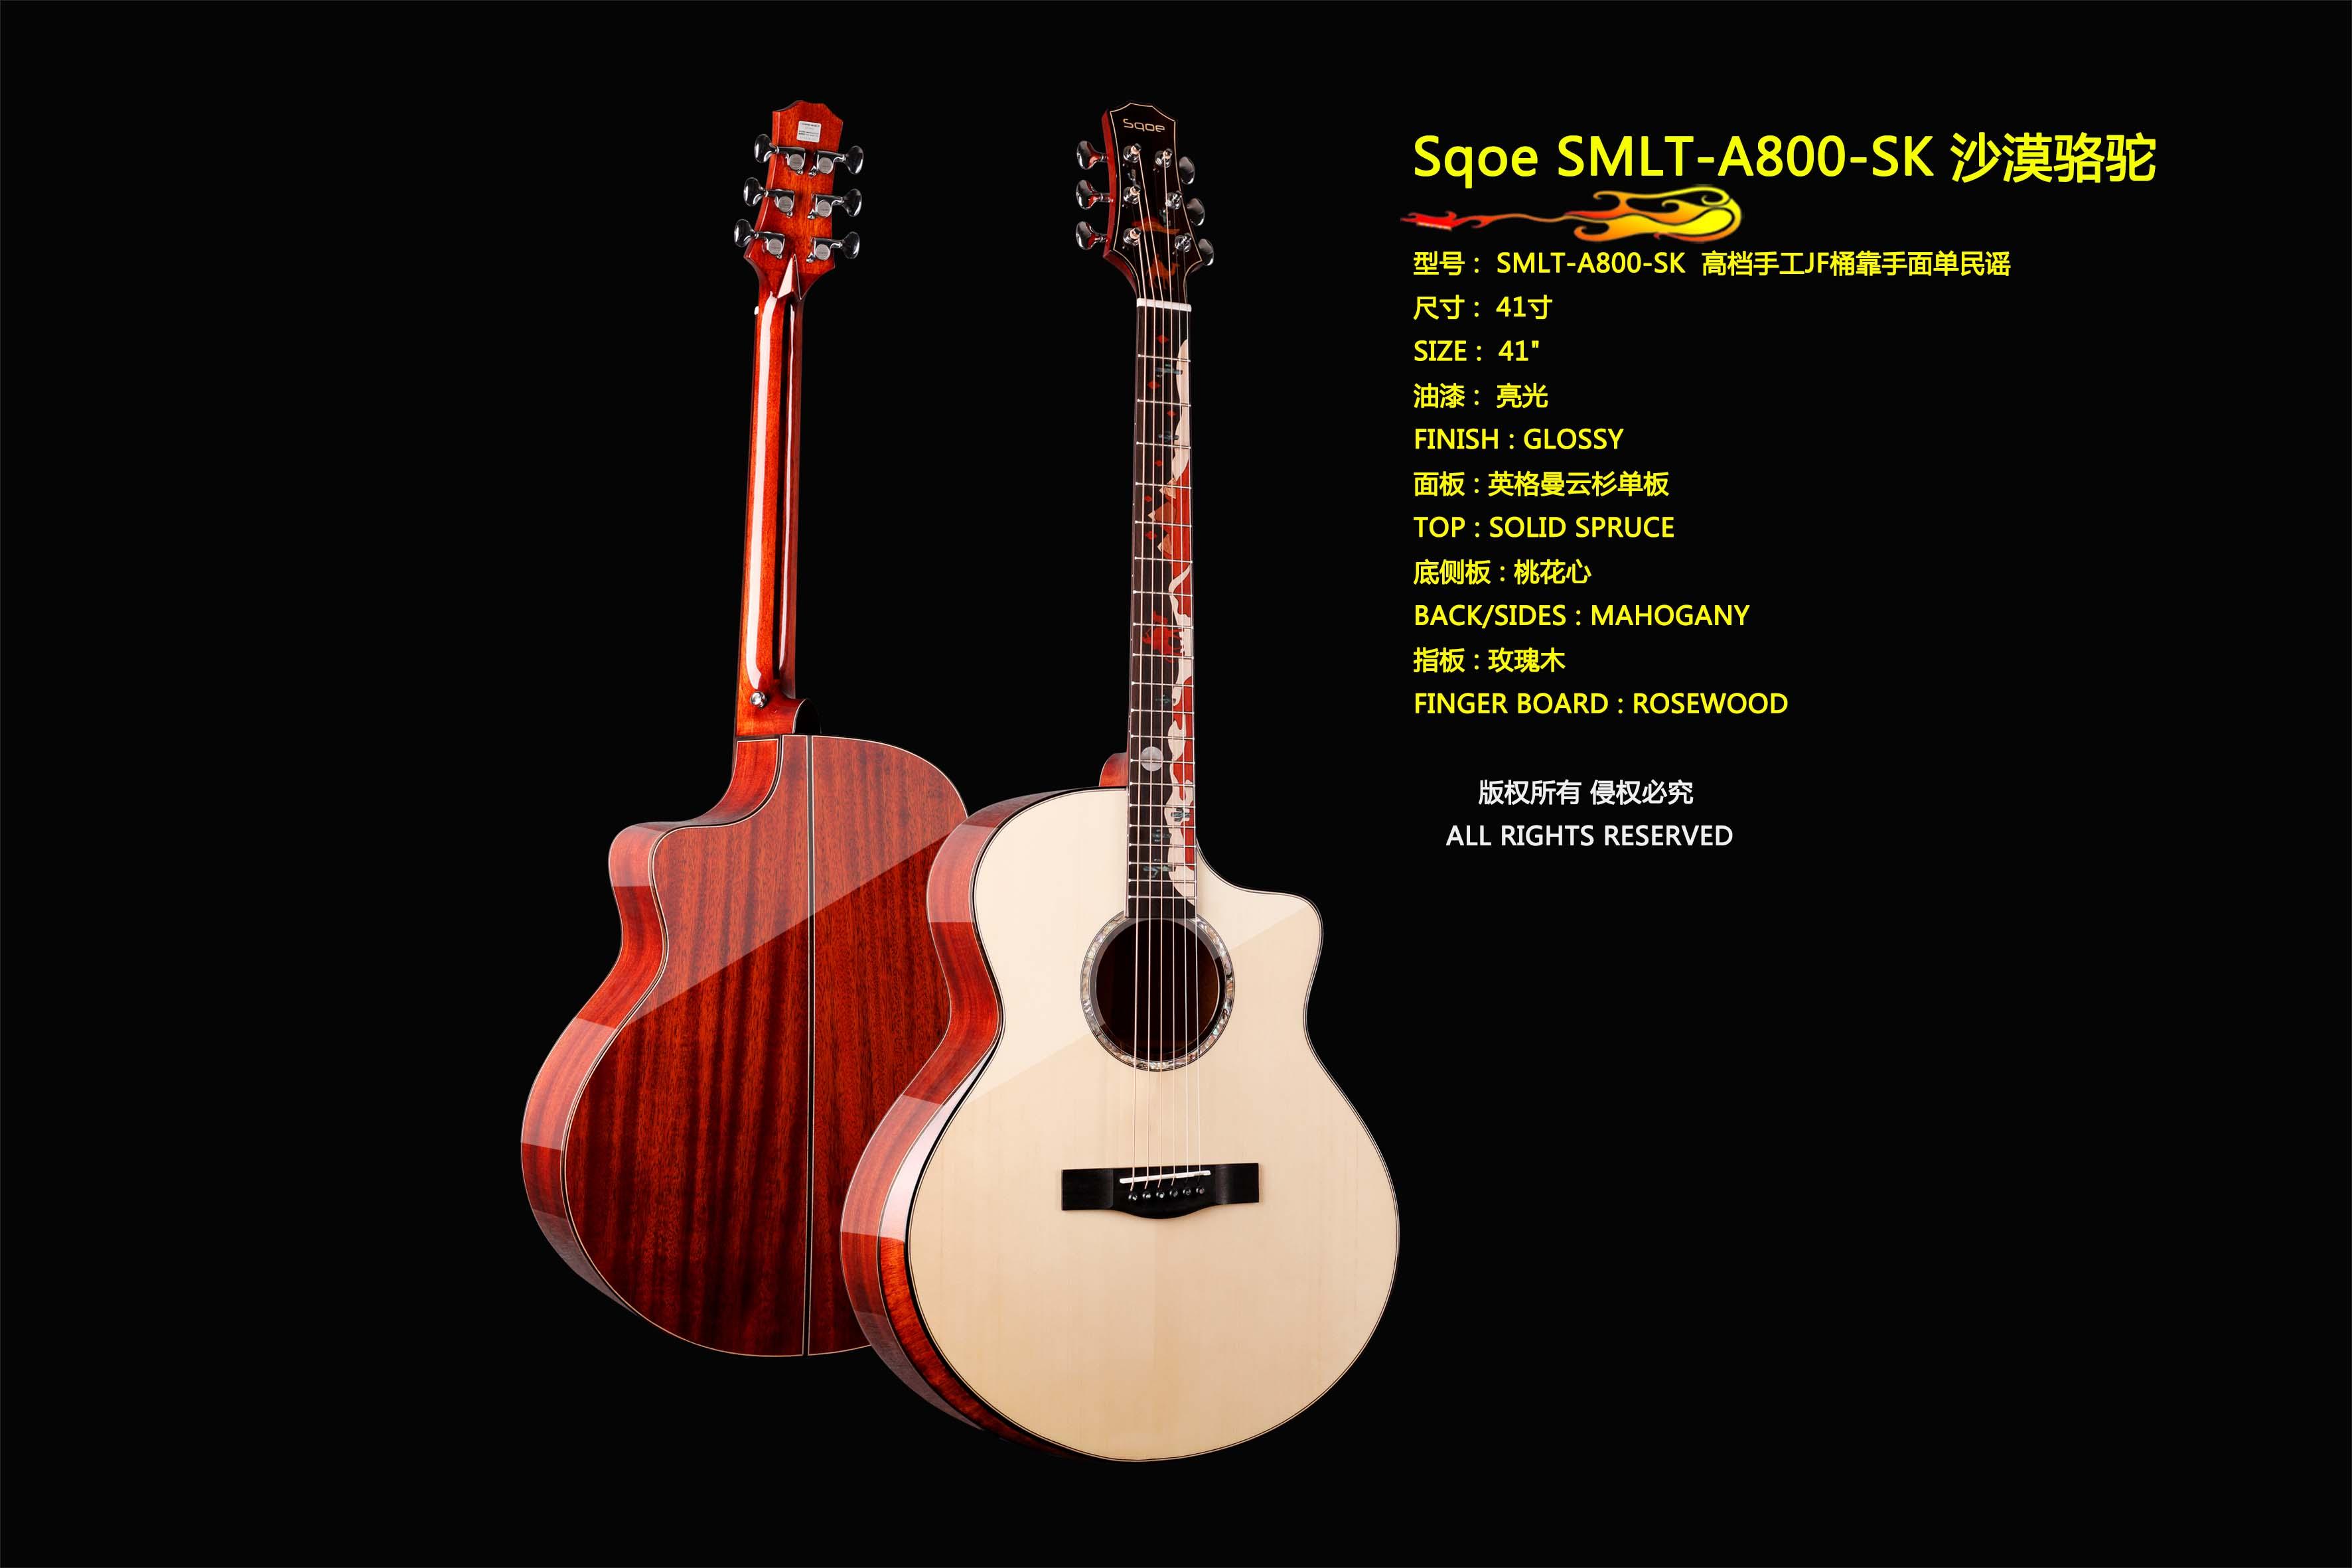 SMLT-A800-SK